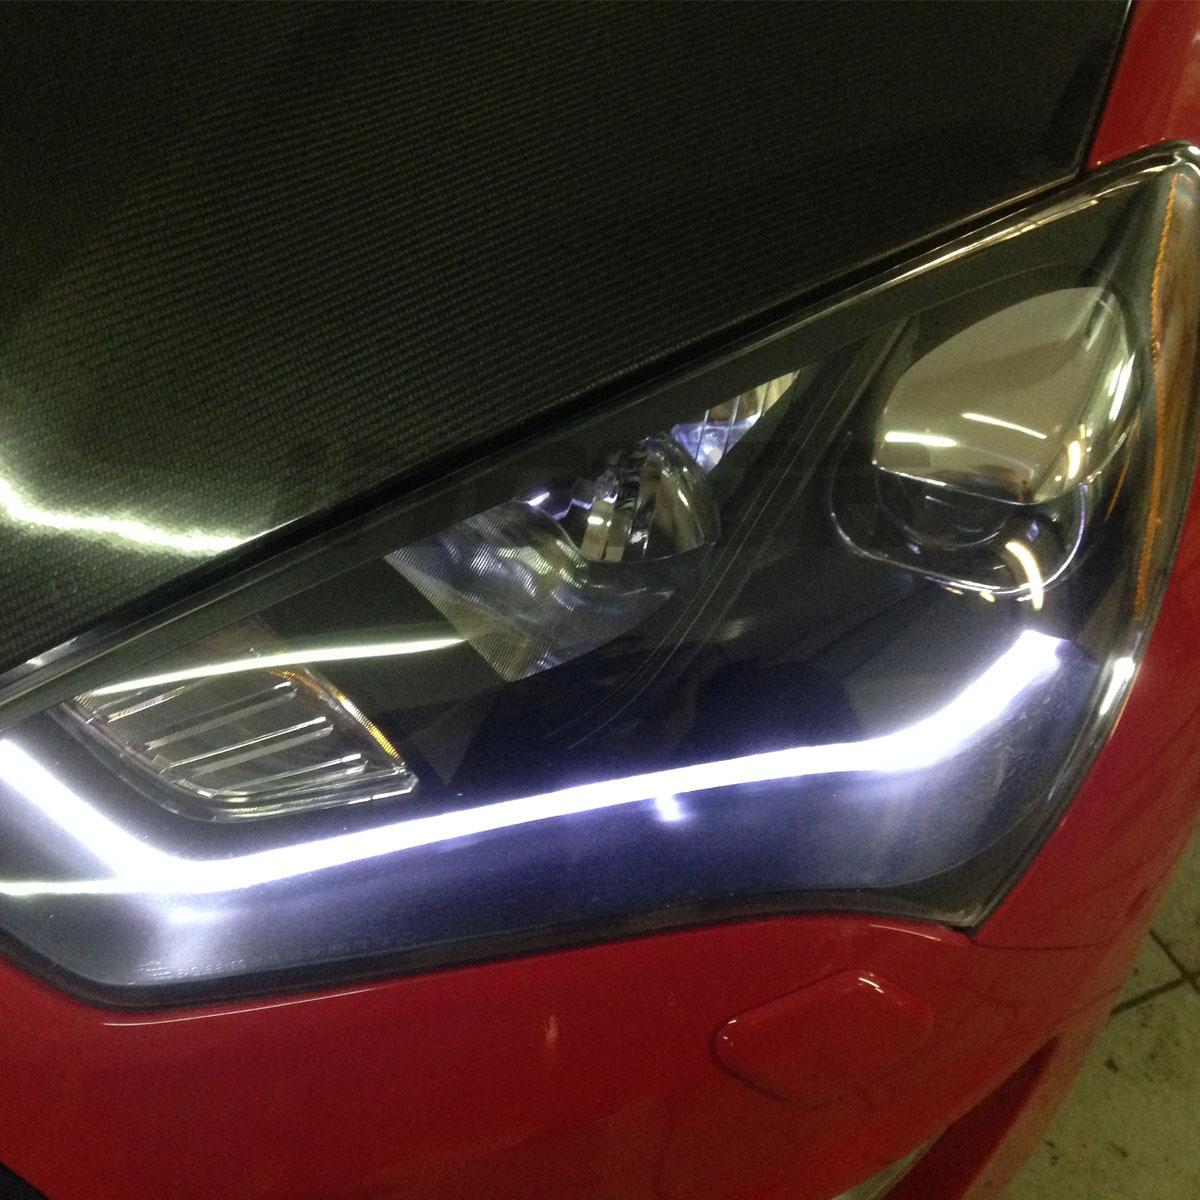 2013 Hyundai Genesis Coupe For Sale >> [HID Model+LED Bar]For 2013 2014 2015 Hyundai Genesis Coupe Black Headlights Set | eBay